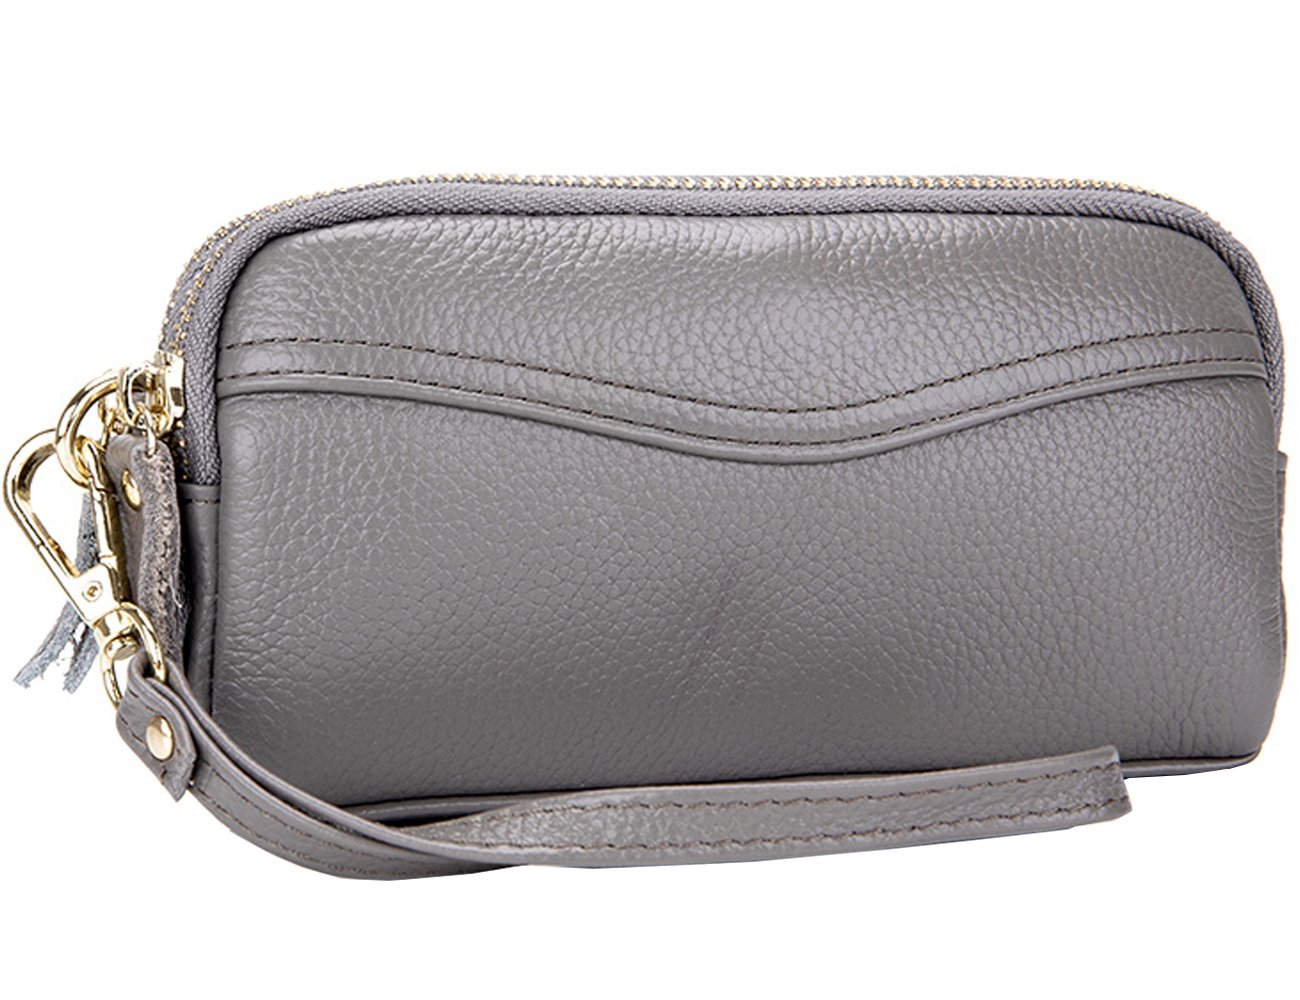 iSuperb Genuine Leather Wristlet Purse Dual Zipper Wallet Clutch Bag Cell Phone Handbag for Women 6.69 x 3.94 x 1.18 inch (Black)